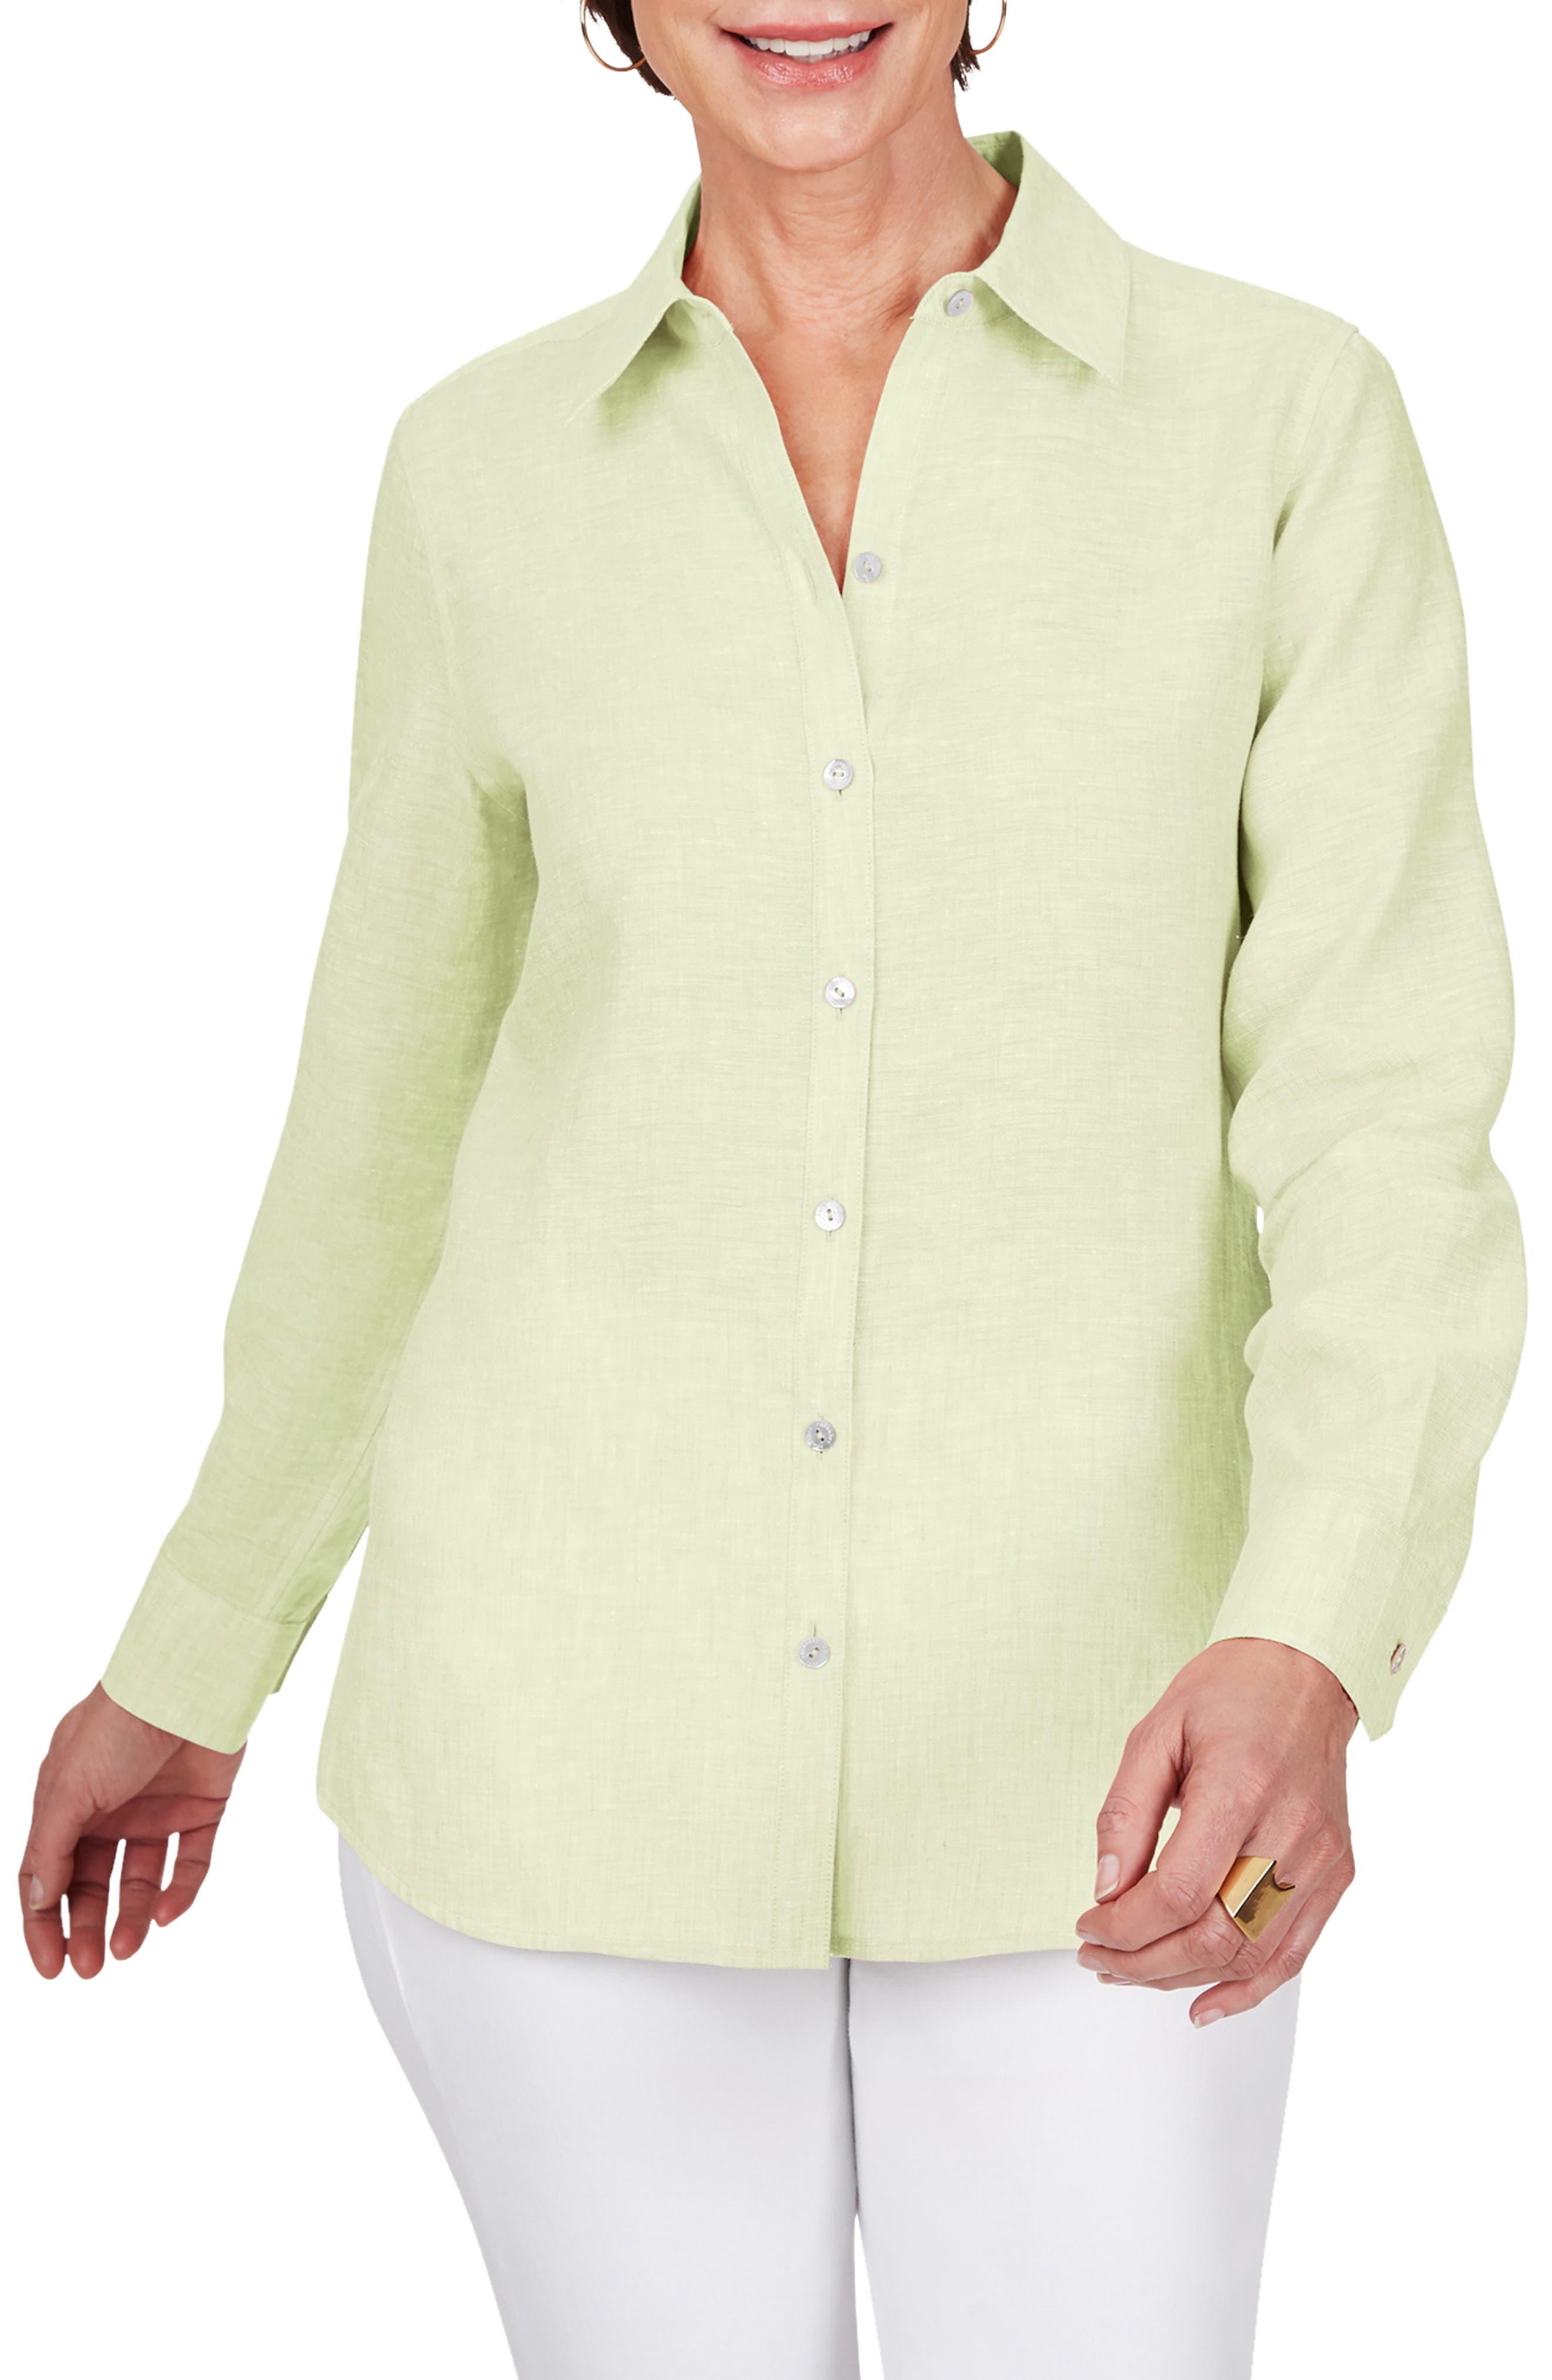 Jordan Non-Iron Linen Chambray Shirt